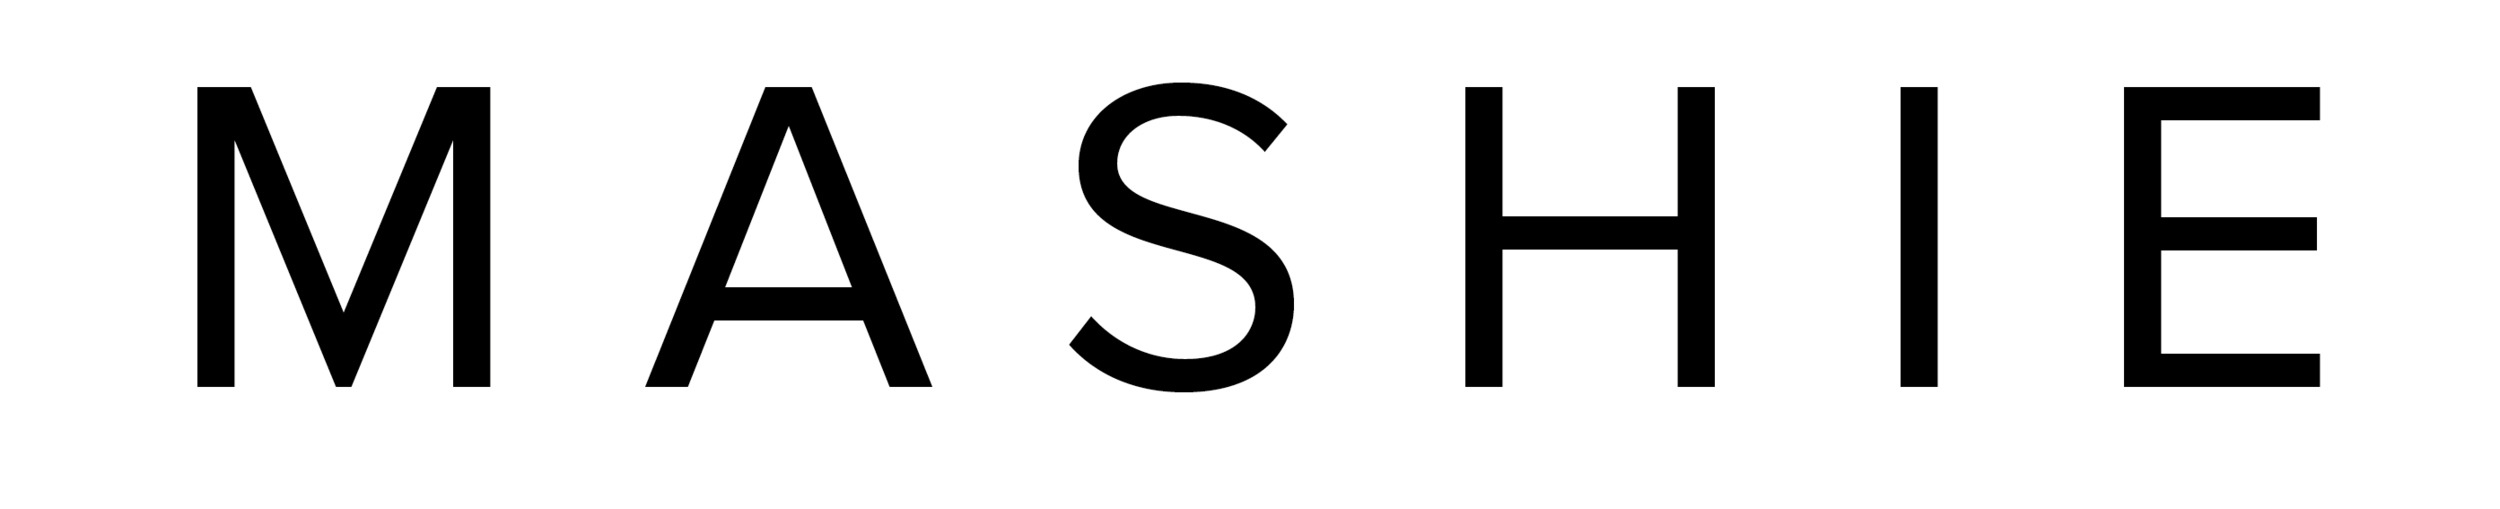 MASHIE LOGO 2018 - Black lettering, white background.png